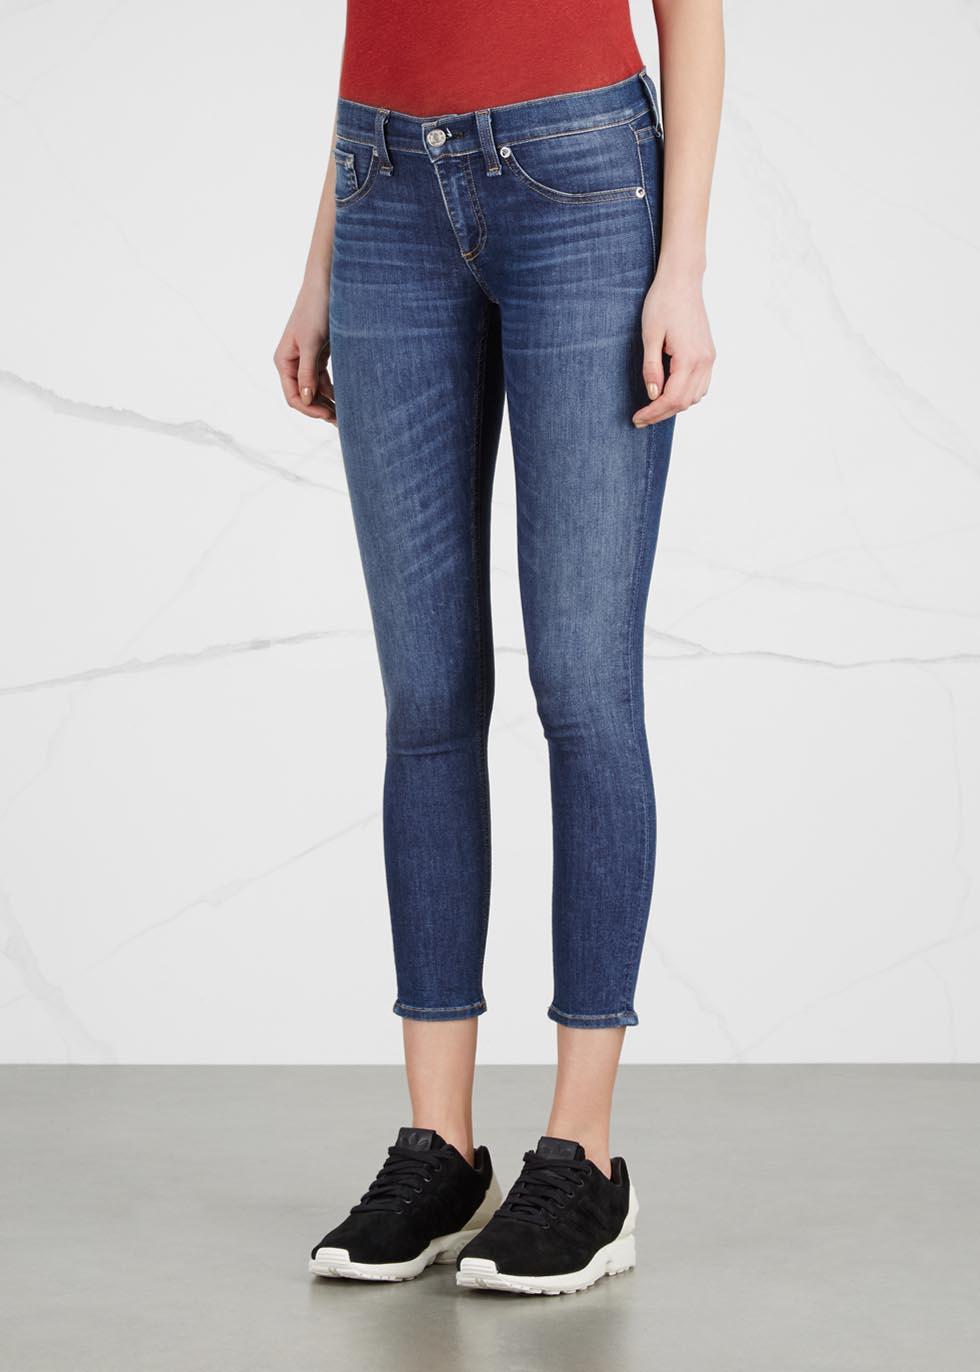 Capri blue cropped skinny jeans - rag & bone